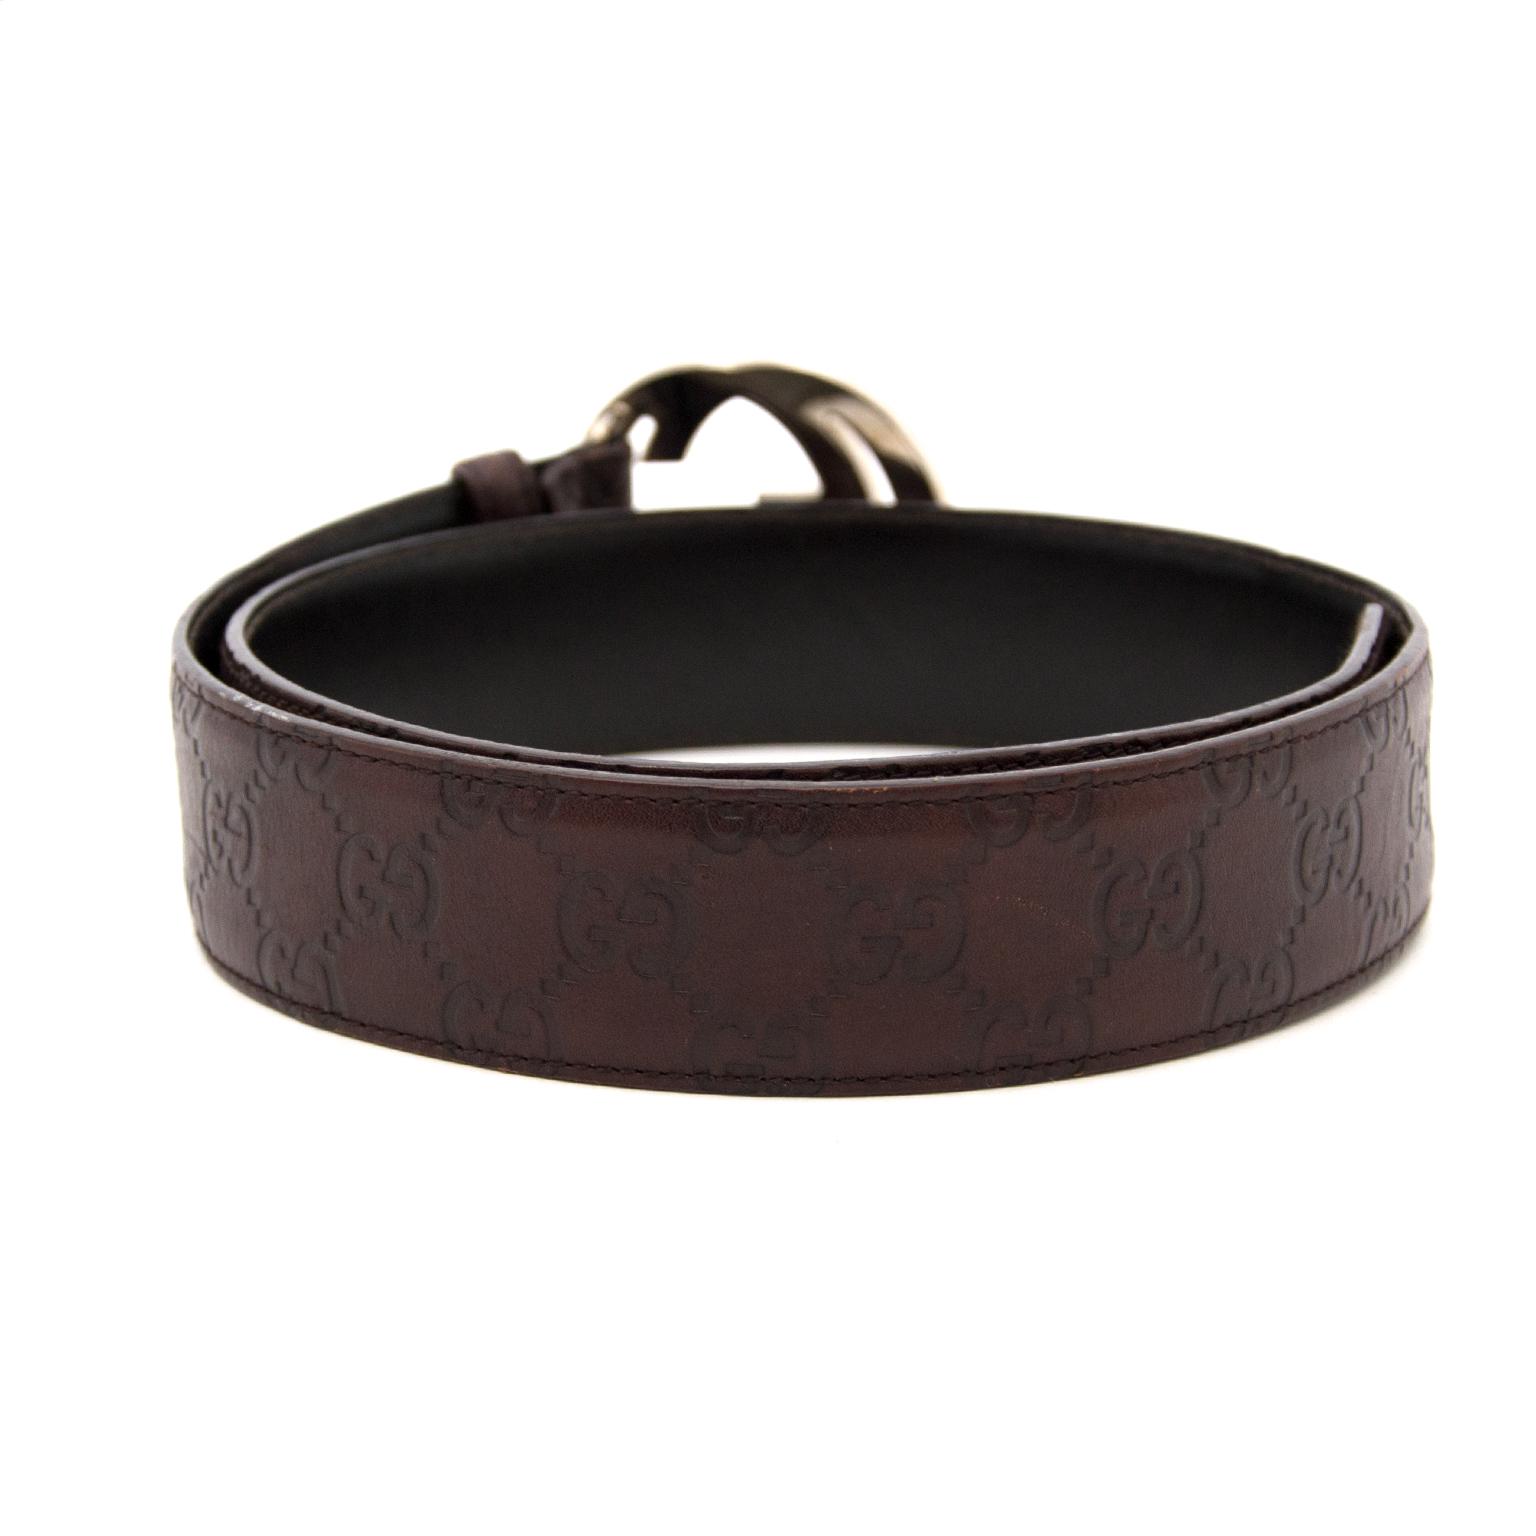 Acheter en ligne chez Labellov.com Gucci Brown Gold Embossed Belt - Size:80